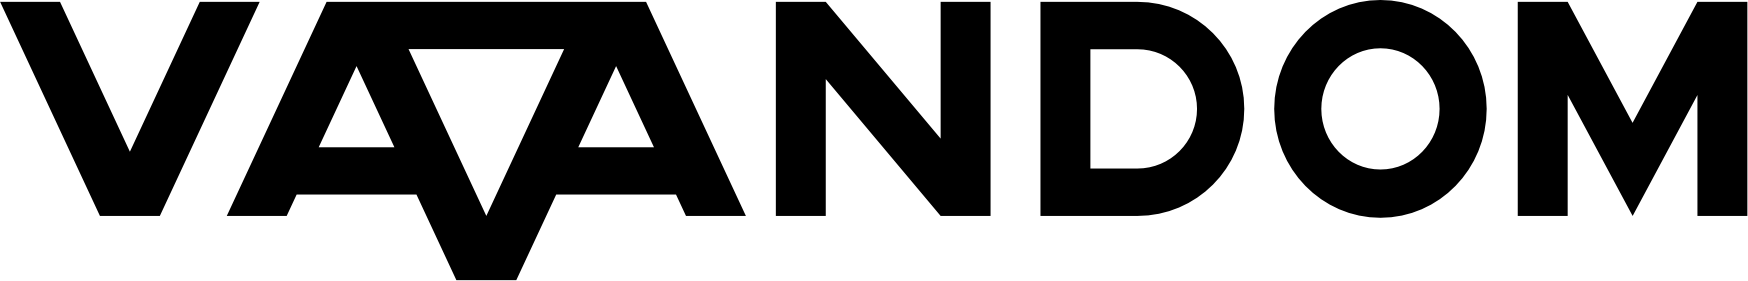 Vaandom logo in black